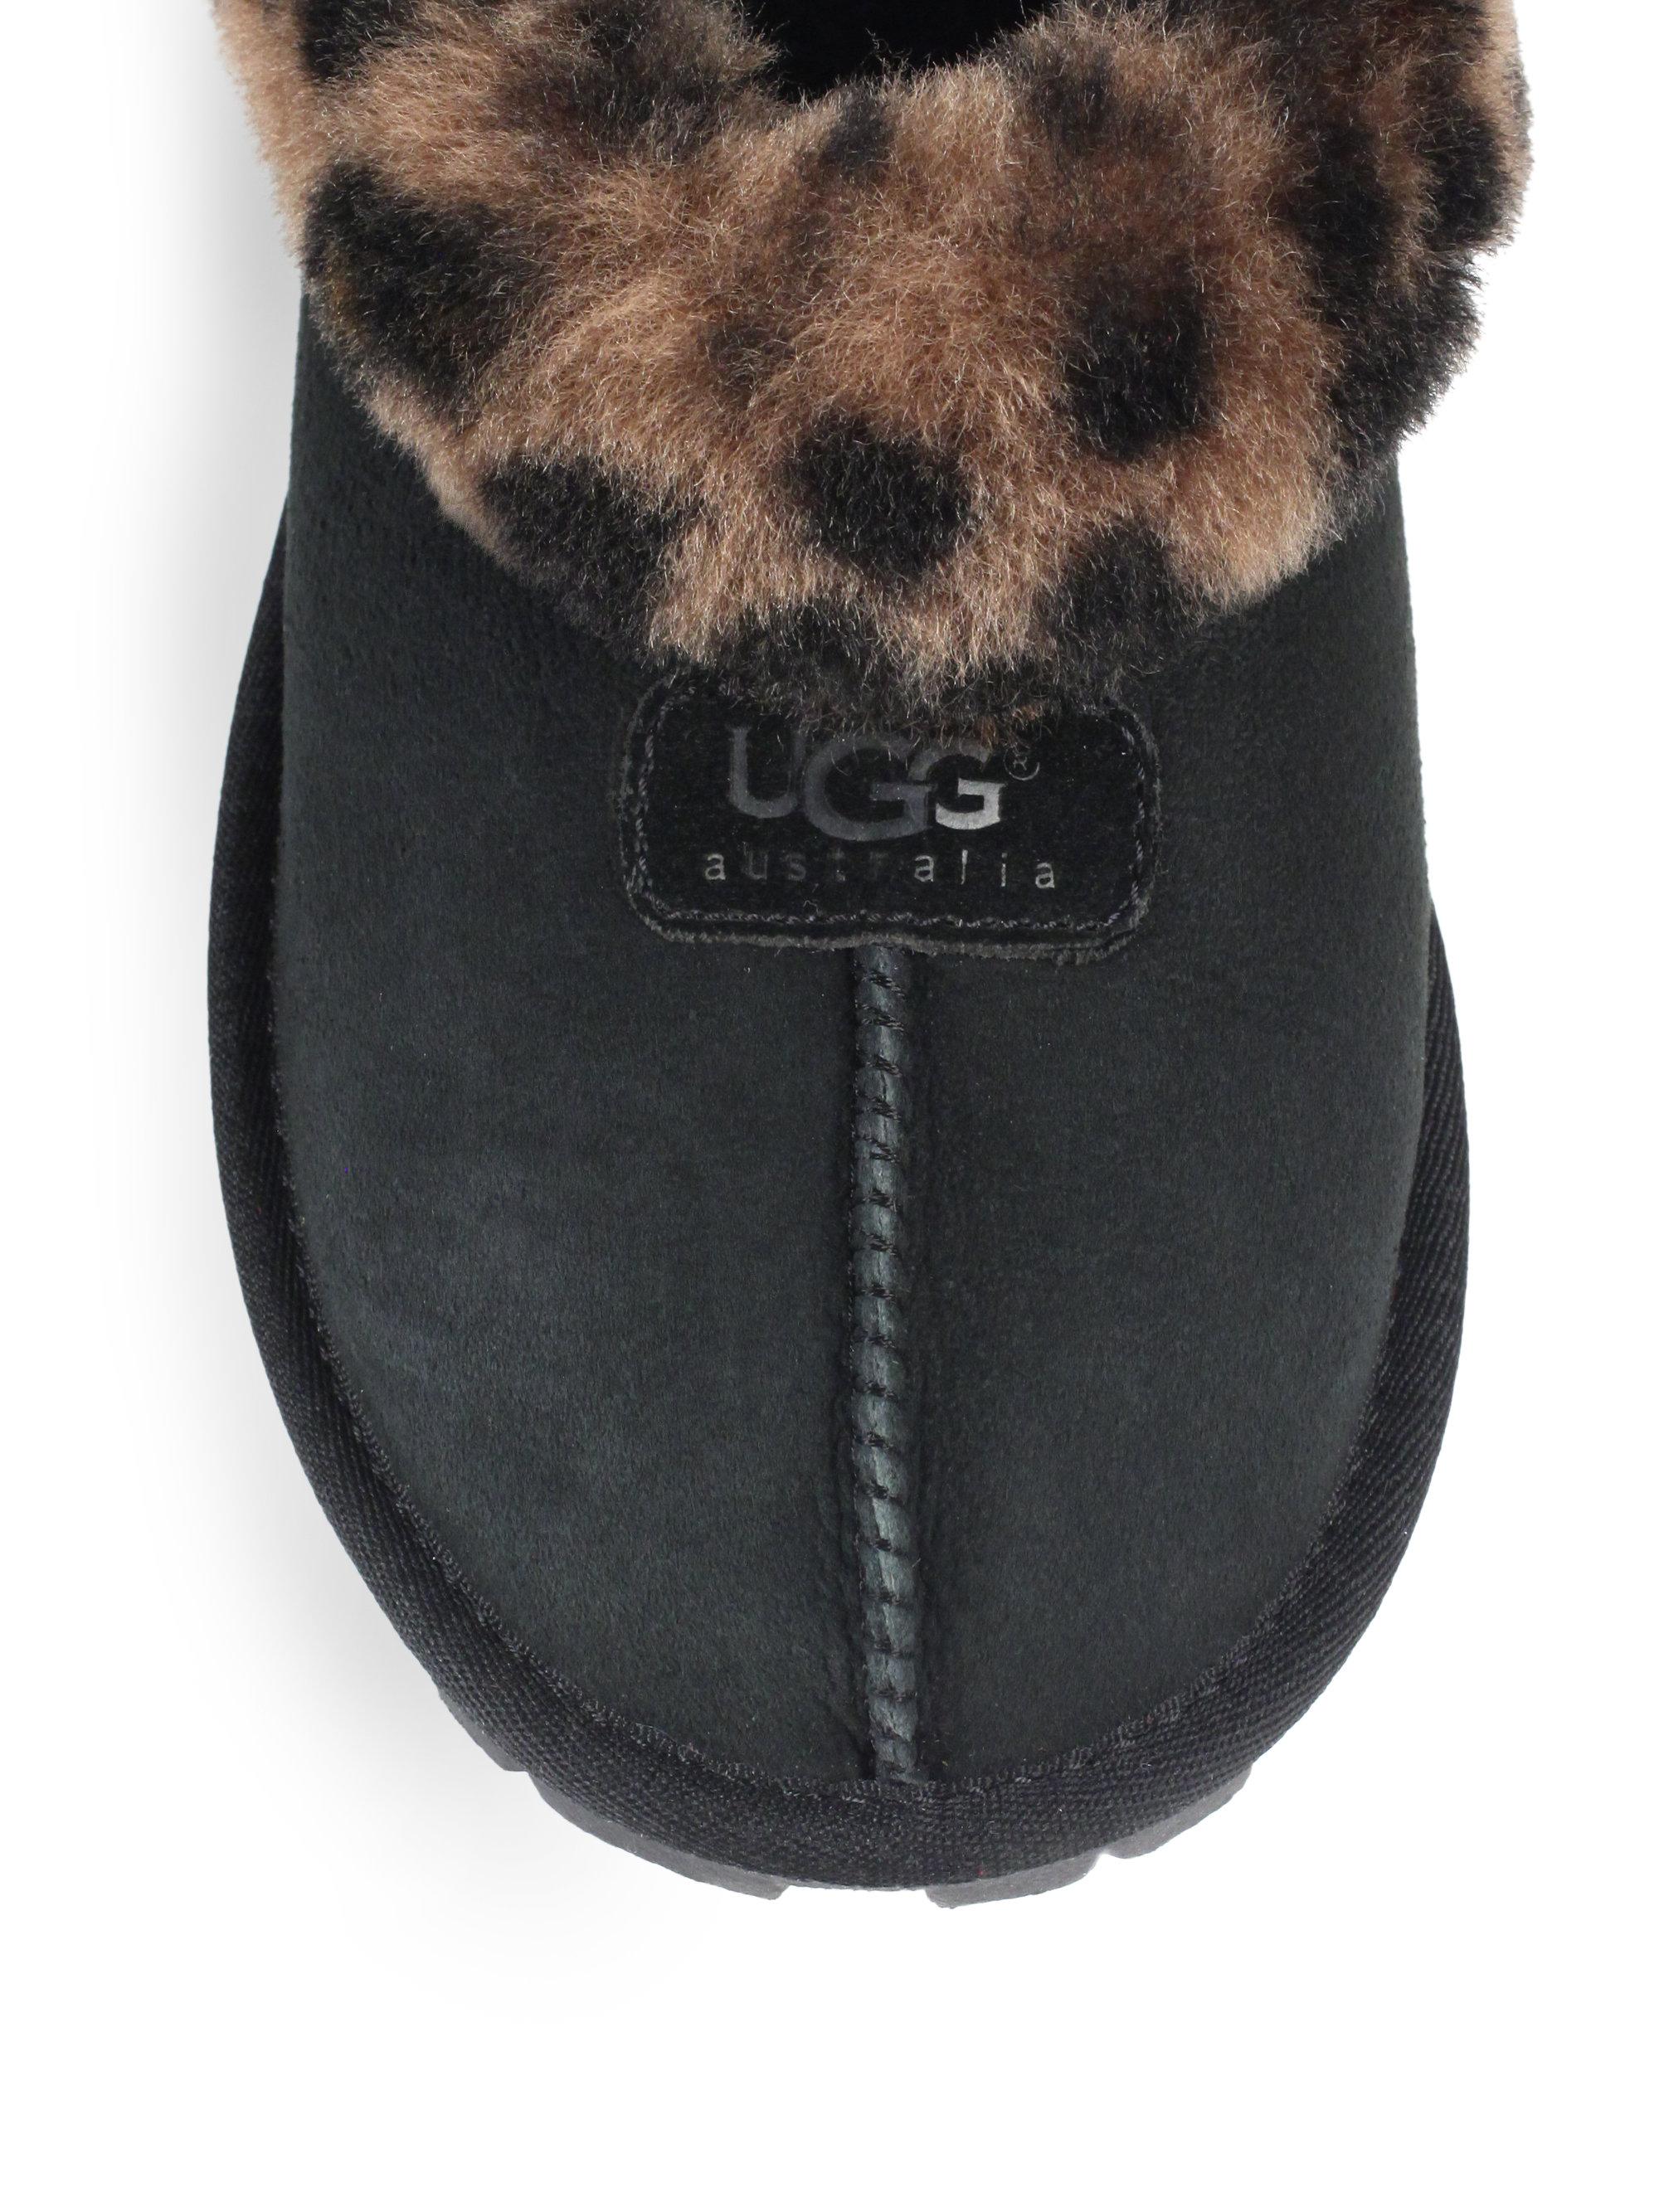 black leopard uggs